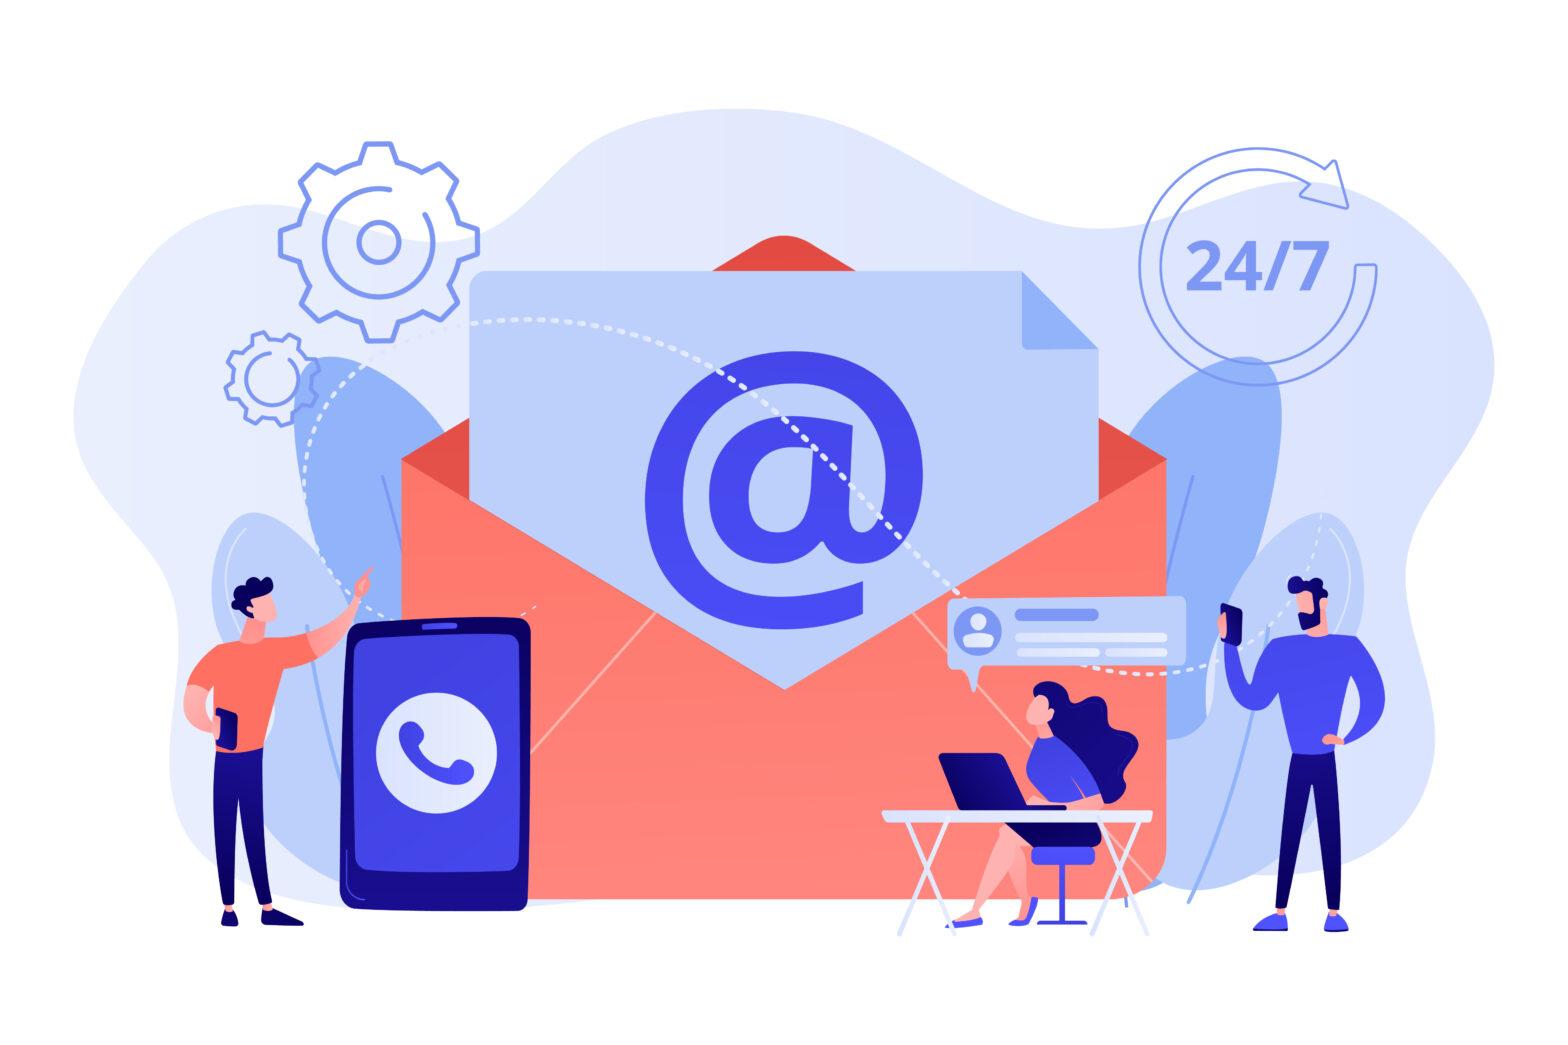 drawing indicating email marketing